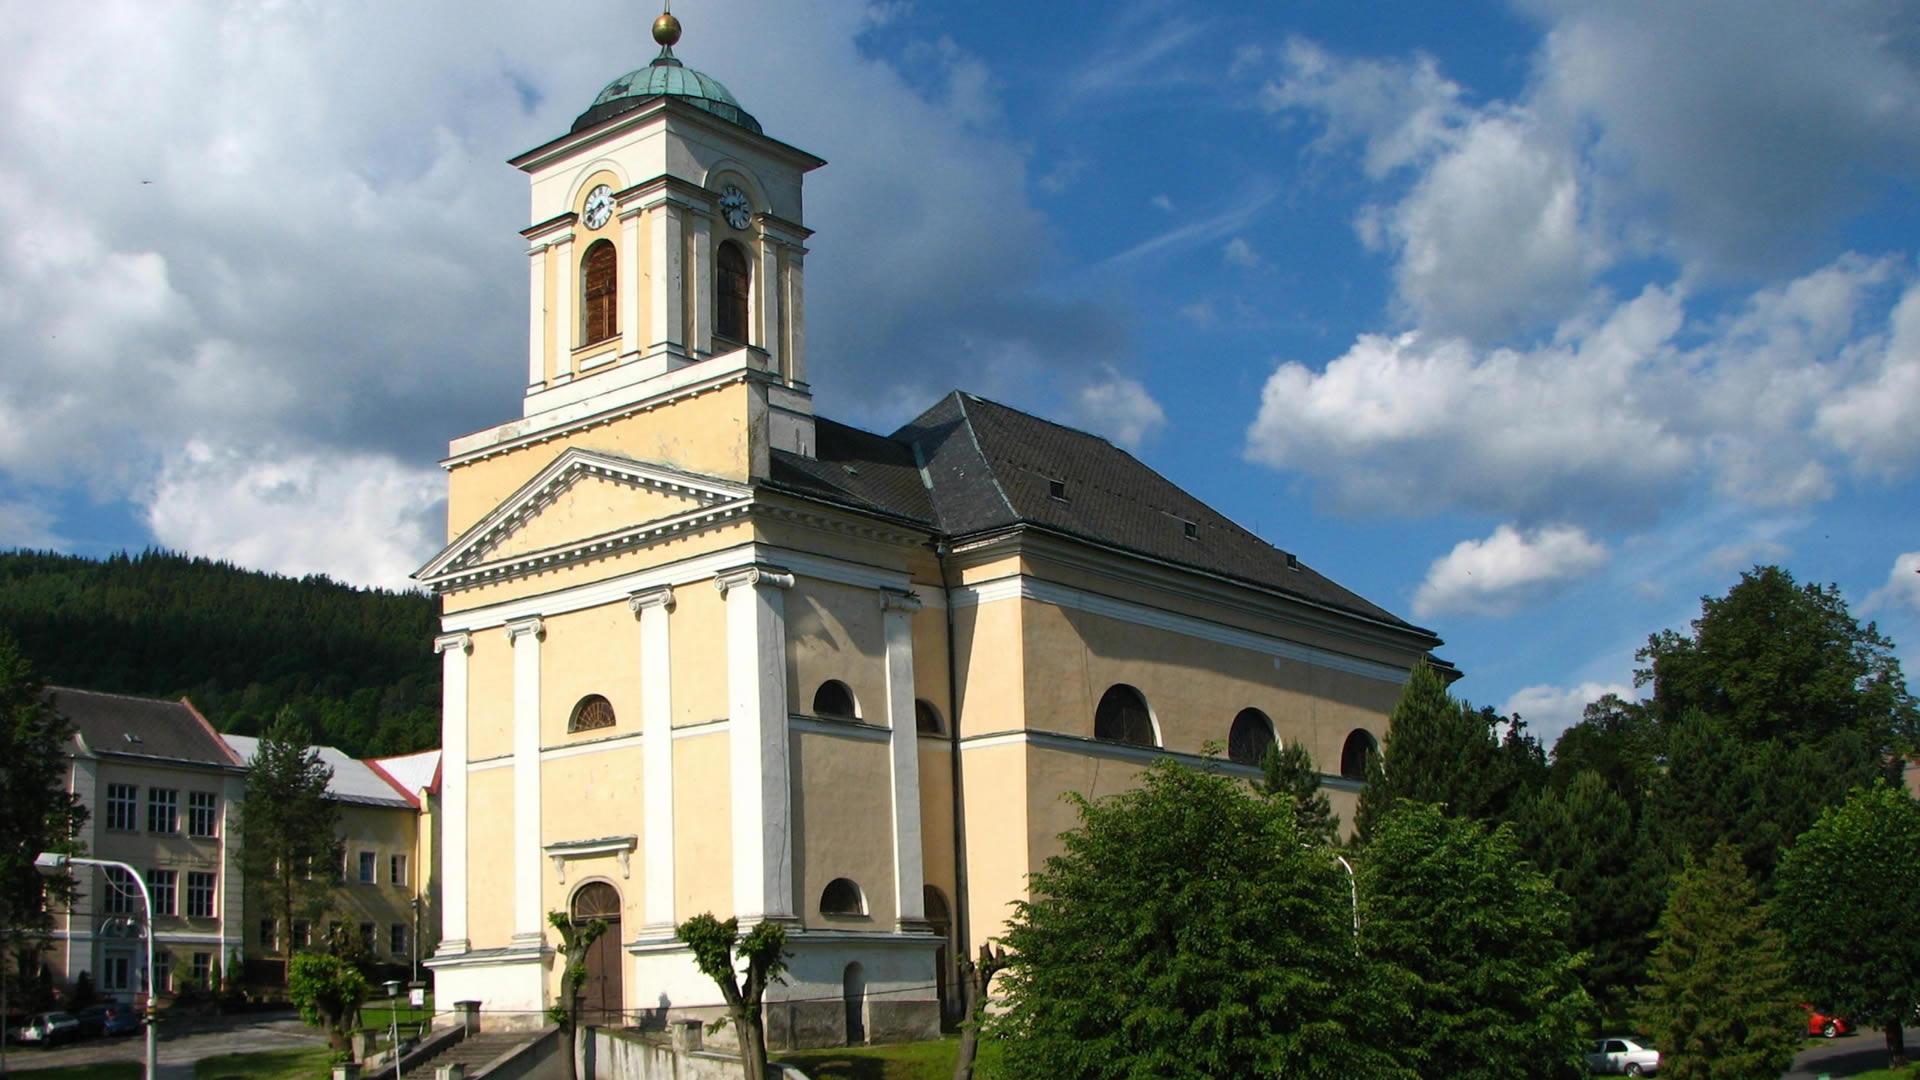 foto: The town of Vrbno pod Pradědem